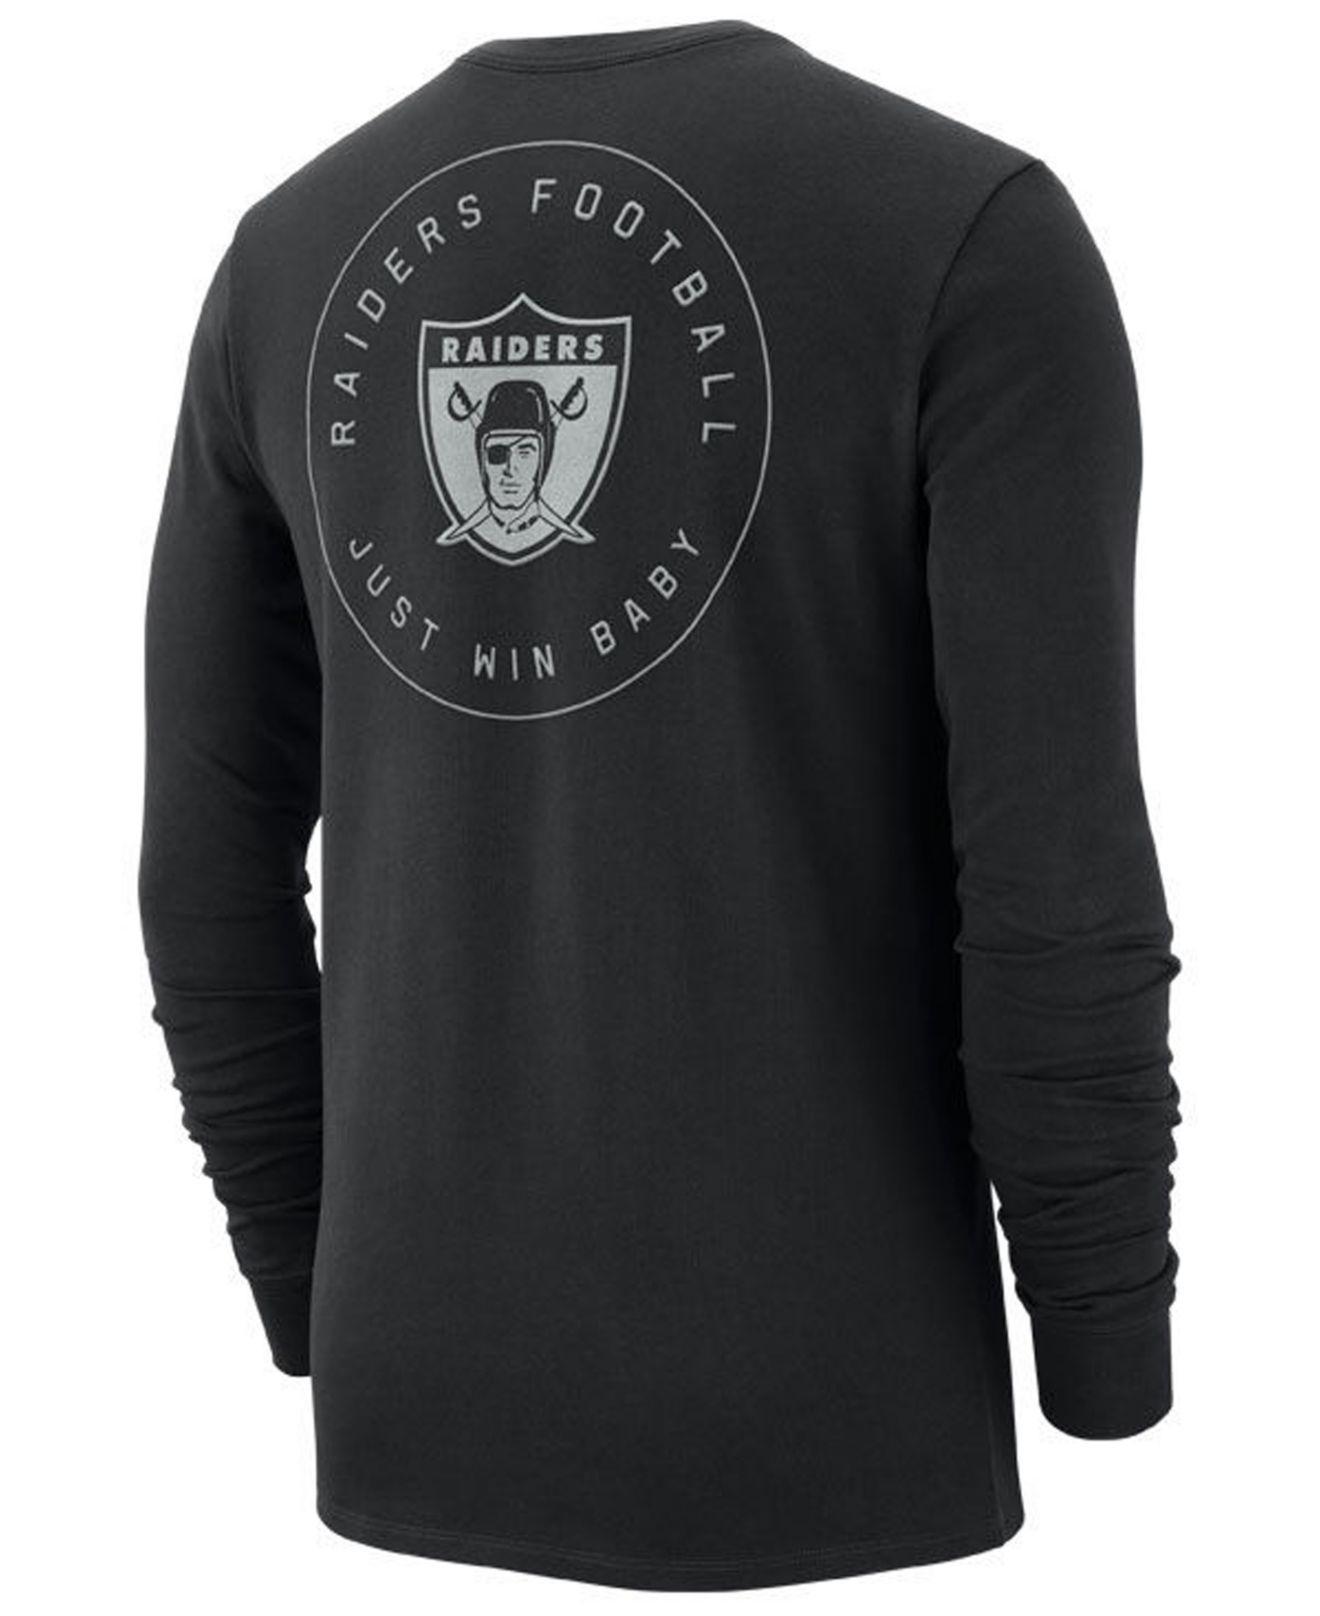 Lyst - Nike Oakland Raiders Heavyweight Seal Long Sleeve T-shirt in Black  for Men 88cc7cb79